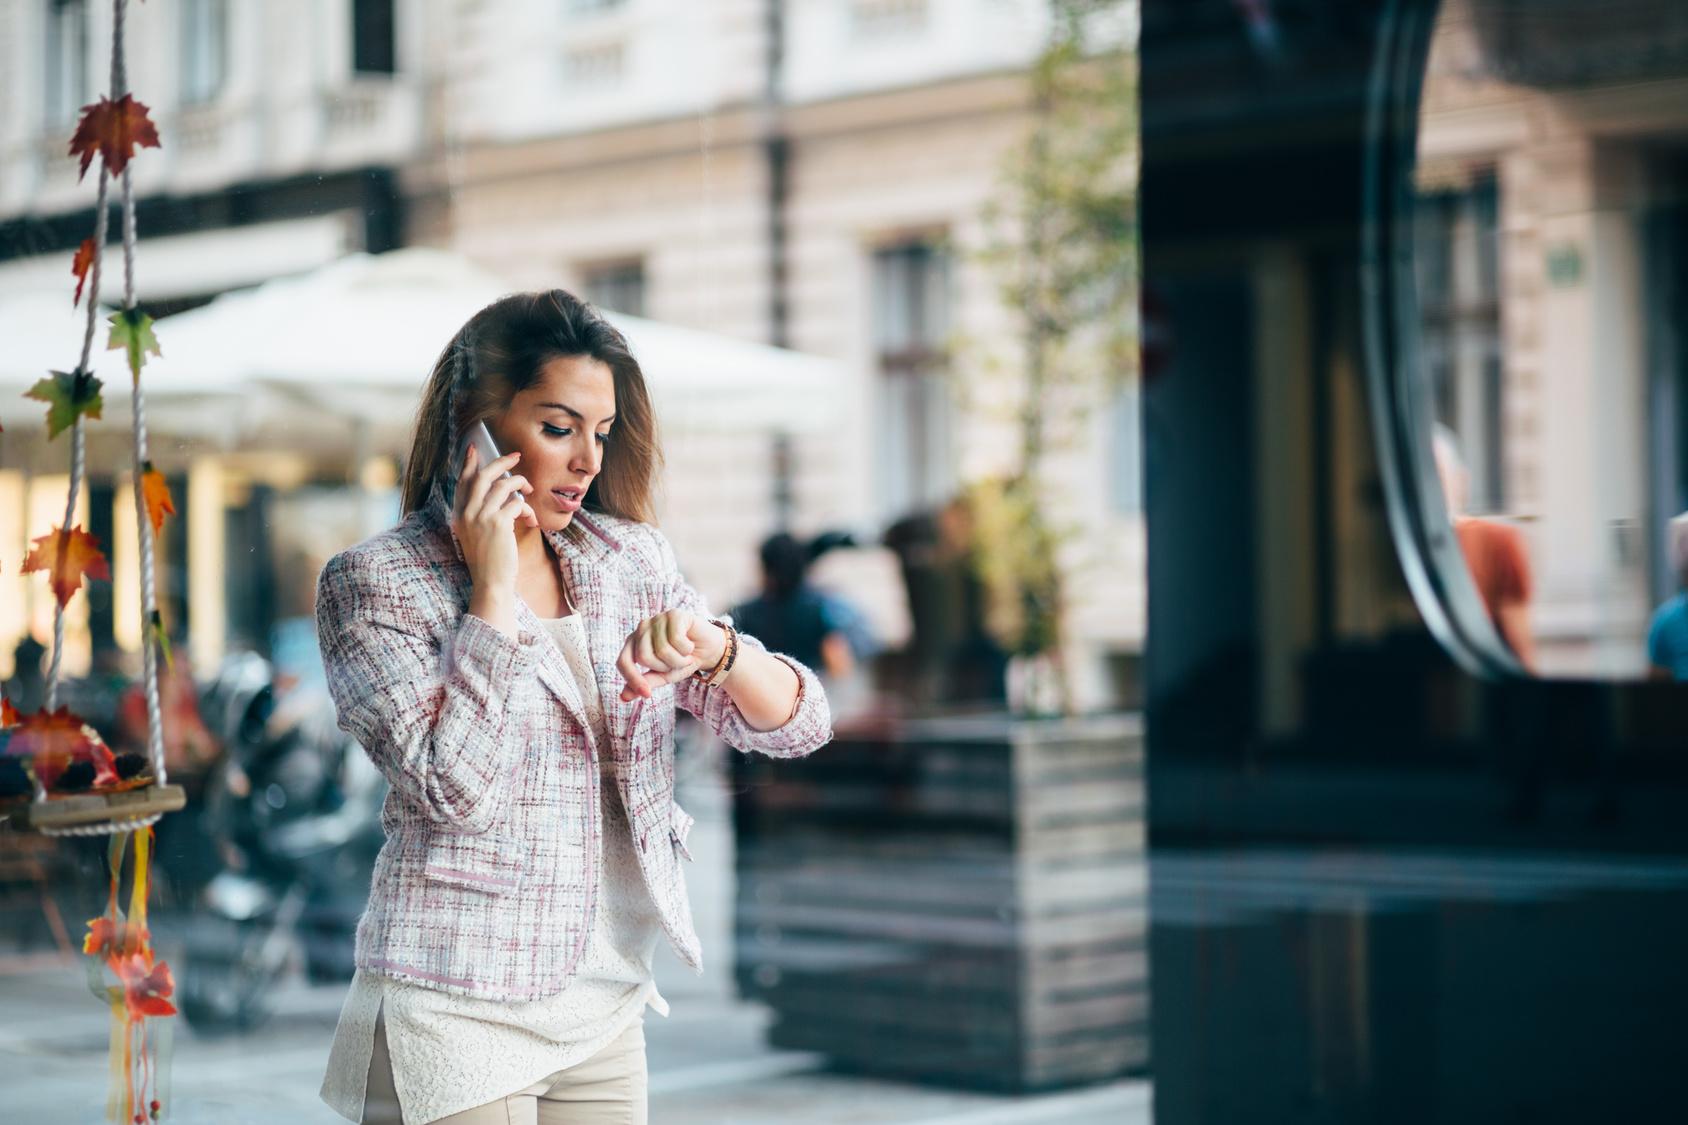 Telemedicine Talking on Phone